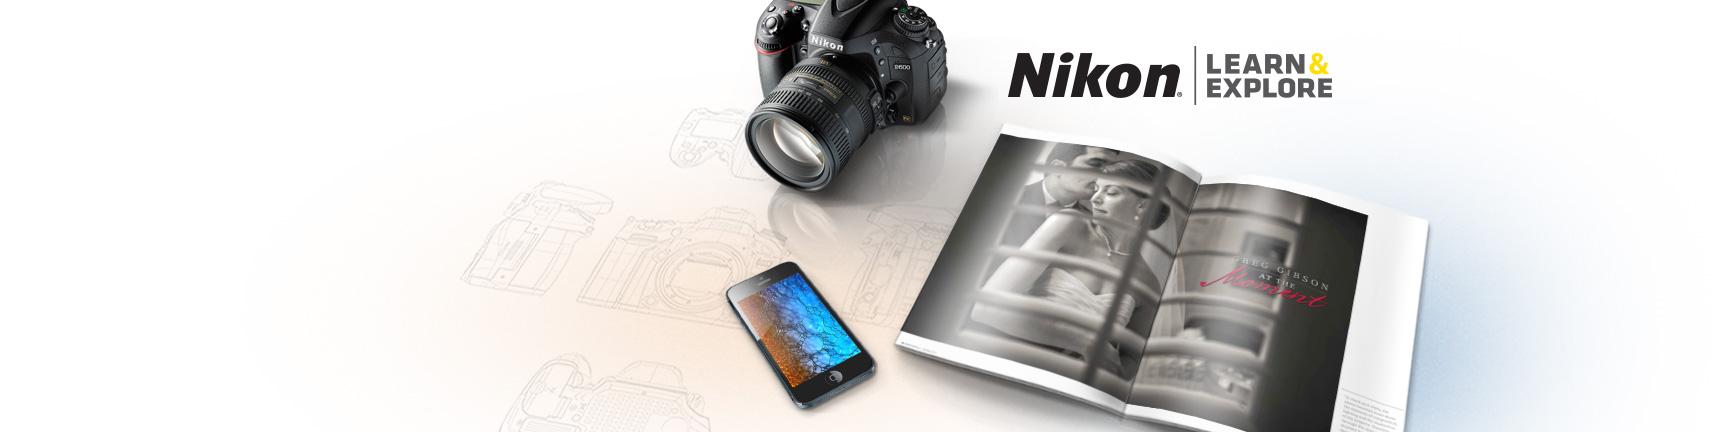 Nikon Learn & Explore iPhone Application - iClarified